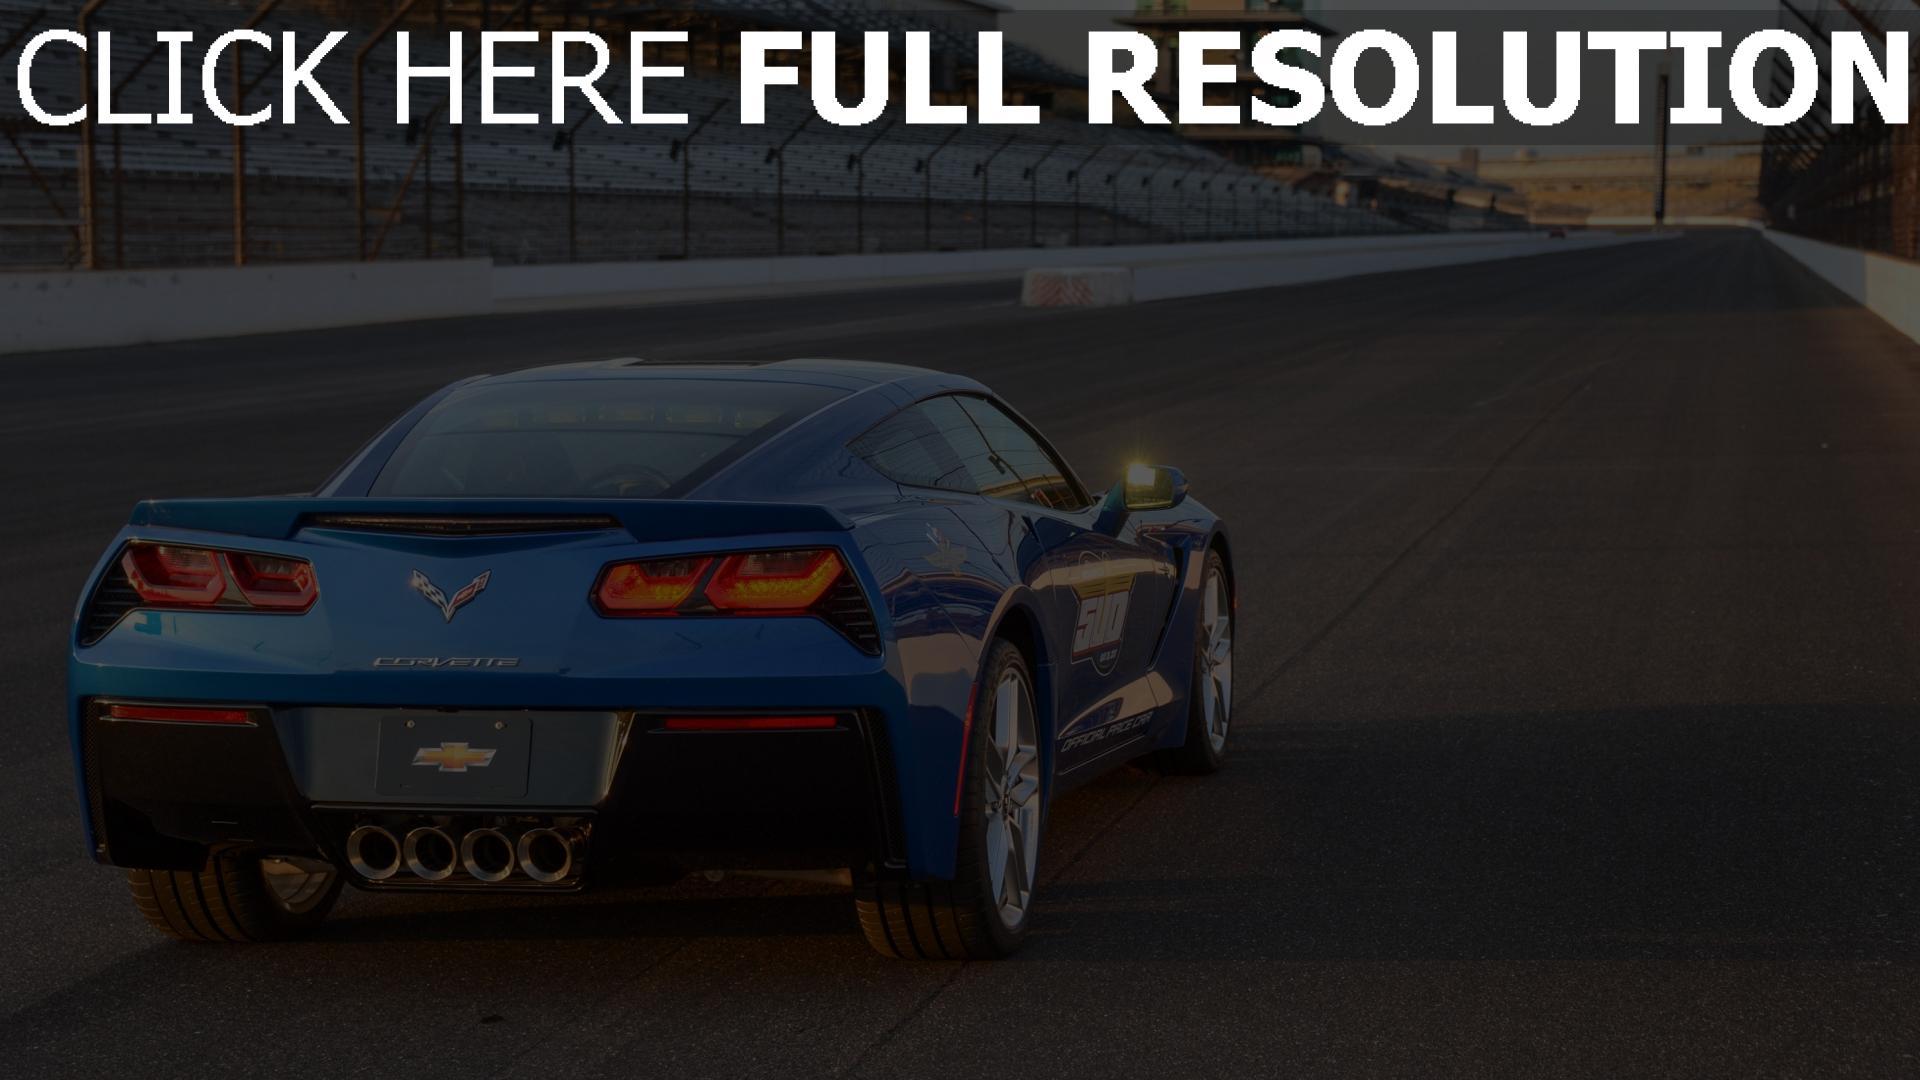 Hd Hintergrundbilder Chevrolet Corvette C7 Stingray Blau